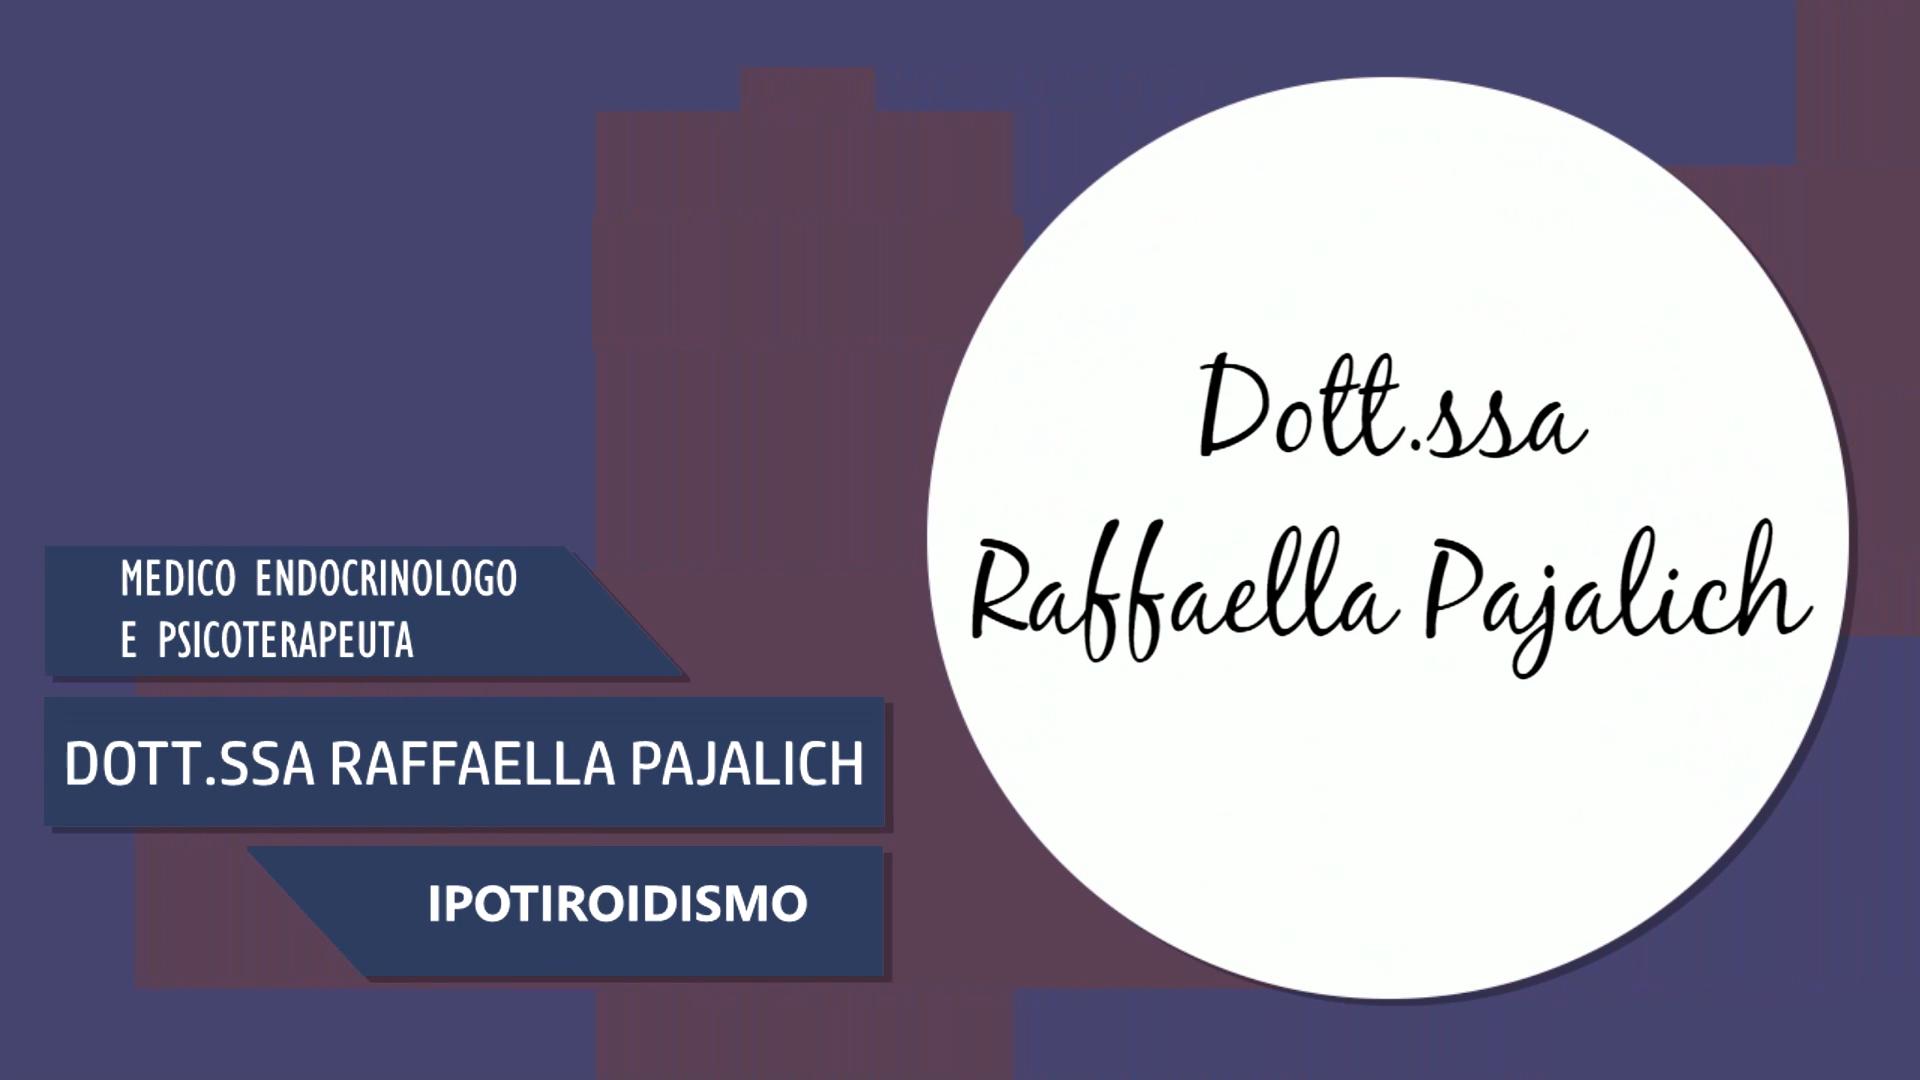 Intervista alla Dott.ssa Raffaella Pajalich – Ipotiroidismo